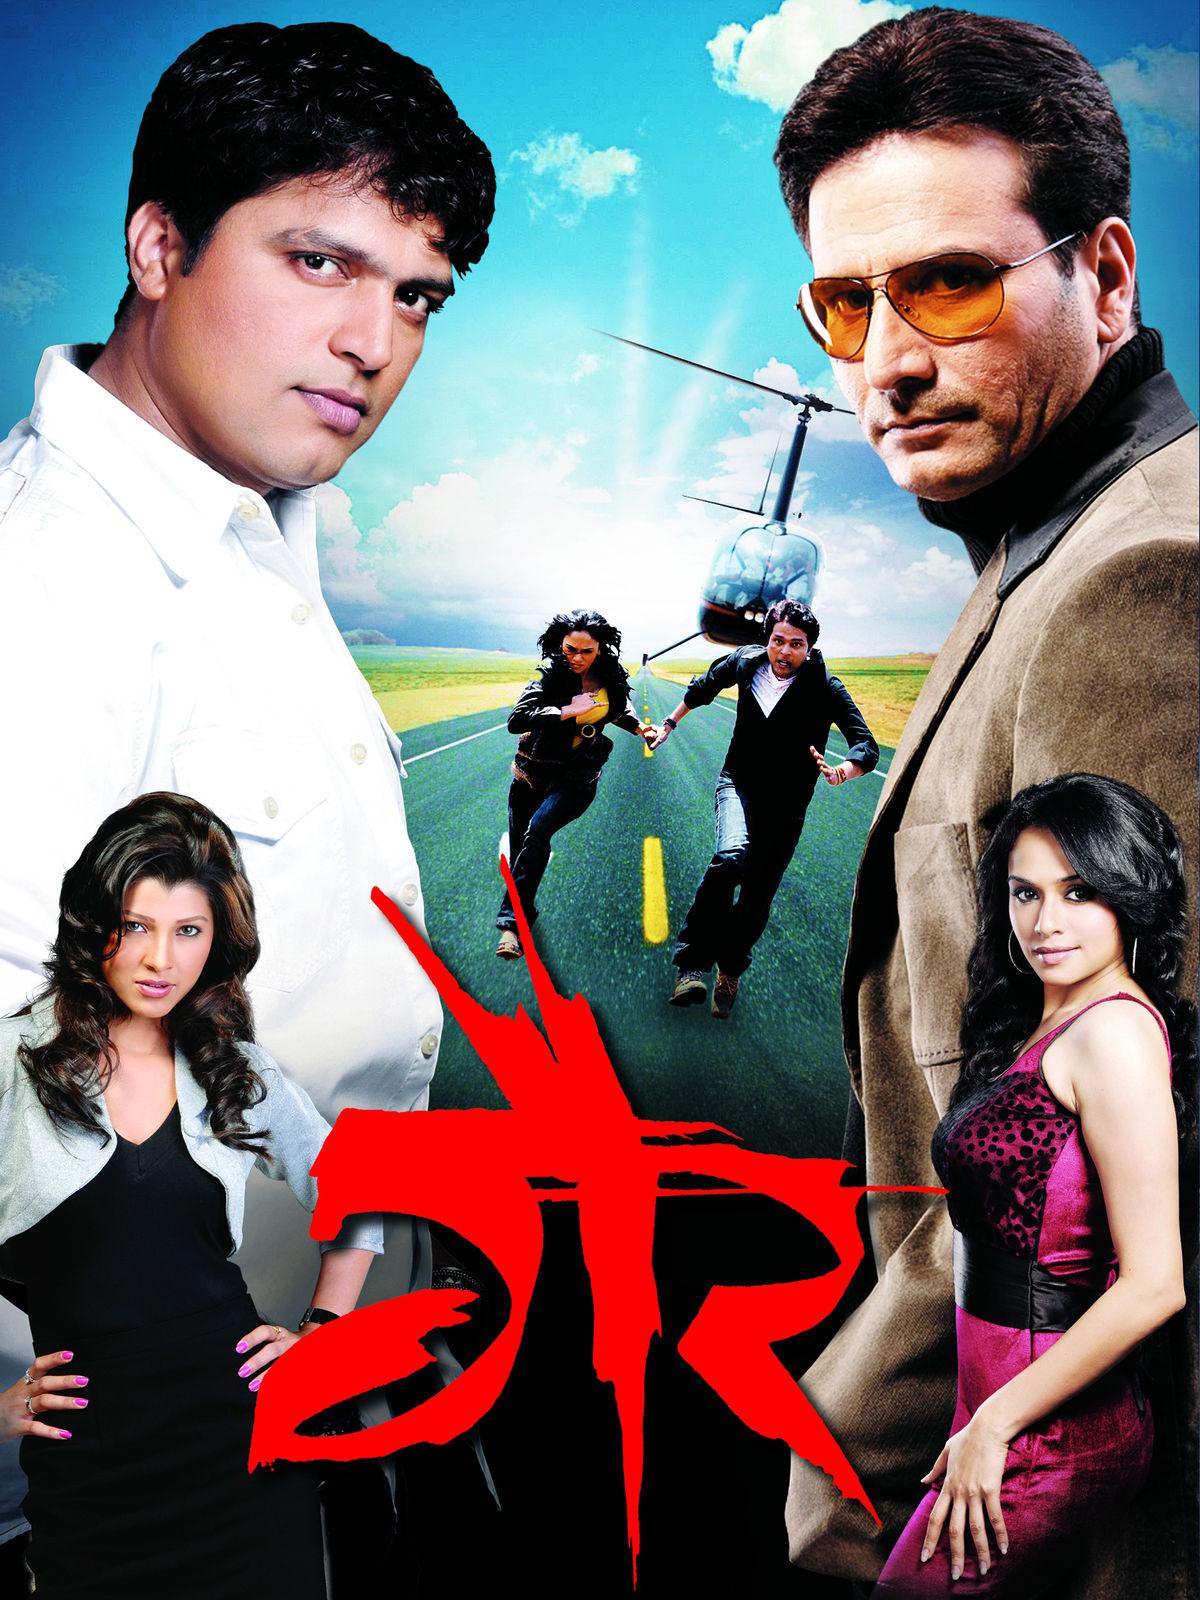 Tejaswini Pandit Best Movies, TV Shows and Web Series List